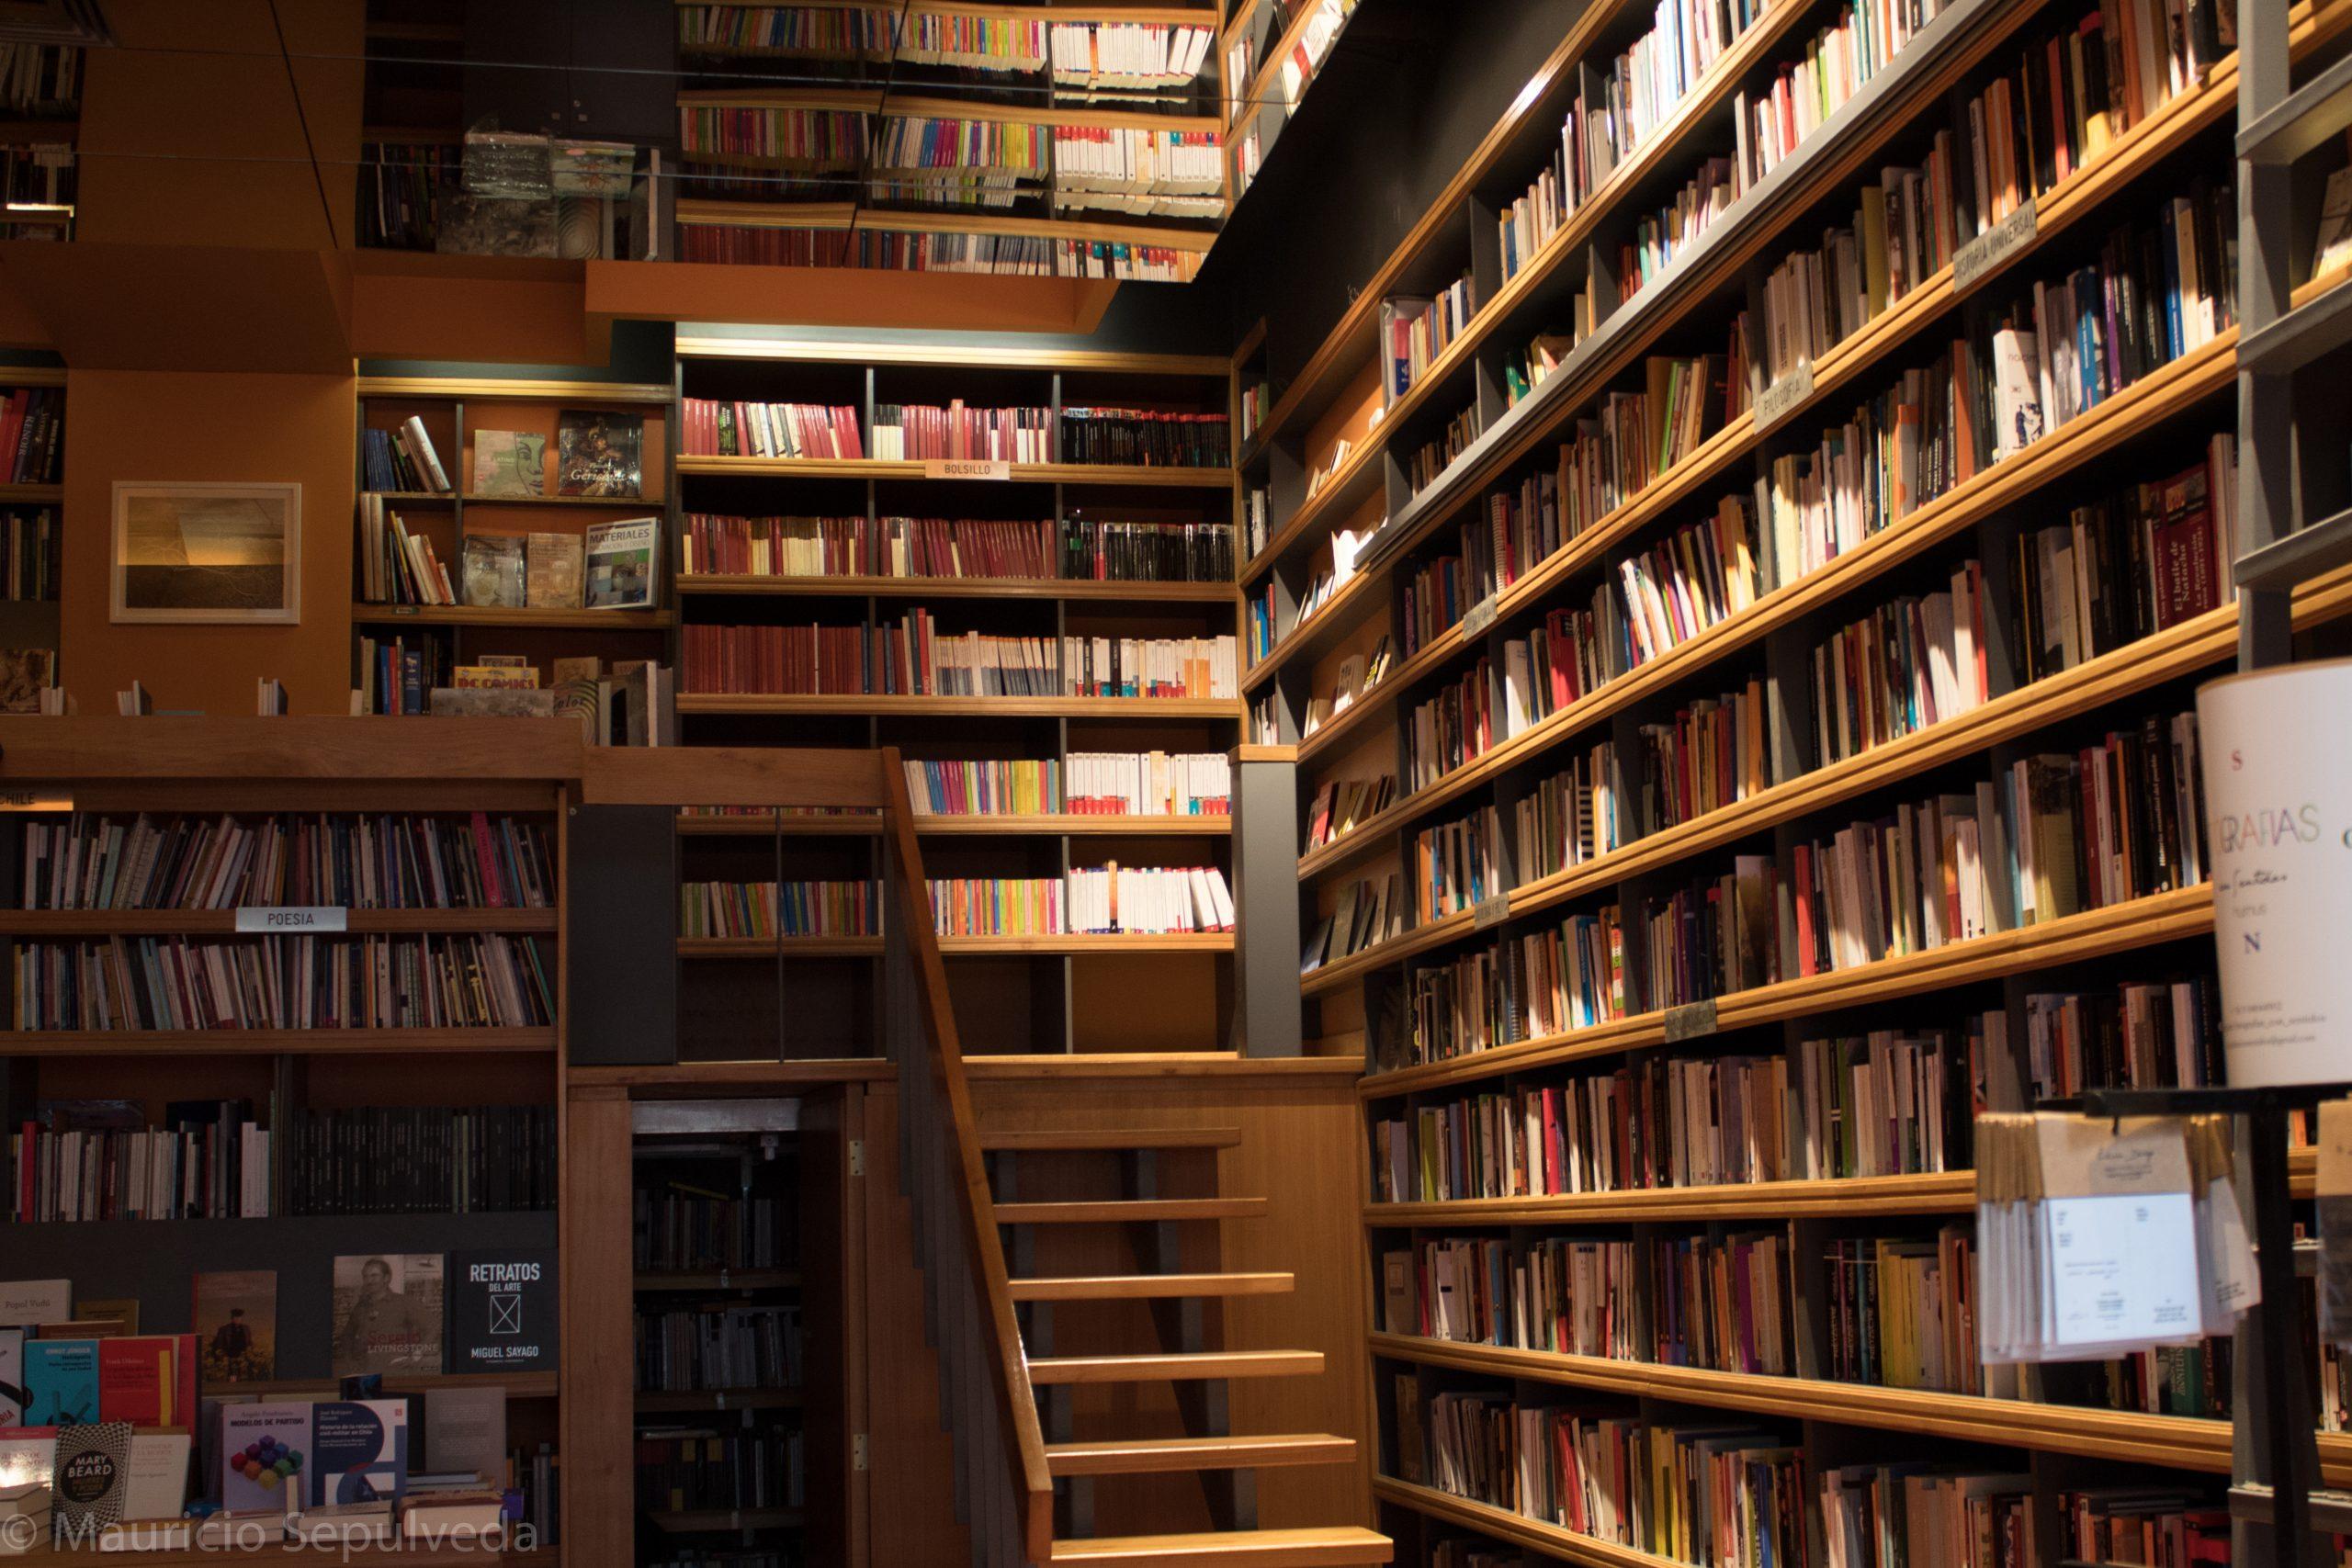 Books n books by Mauricio Sepulveda